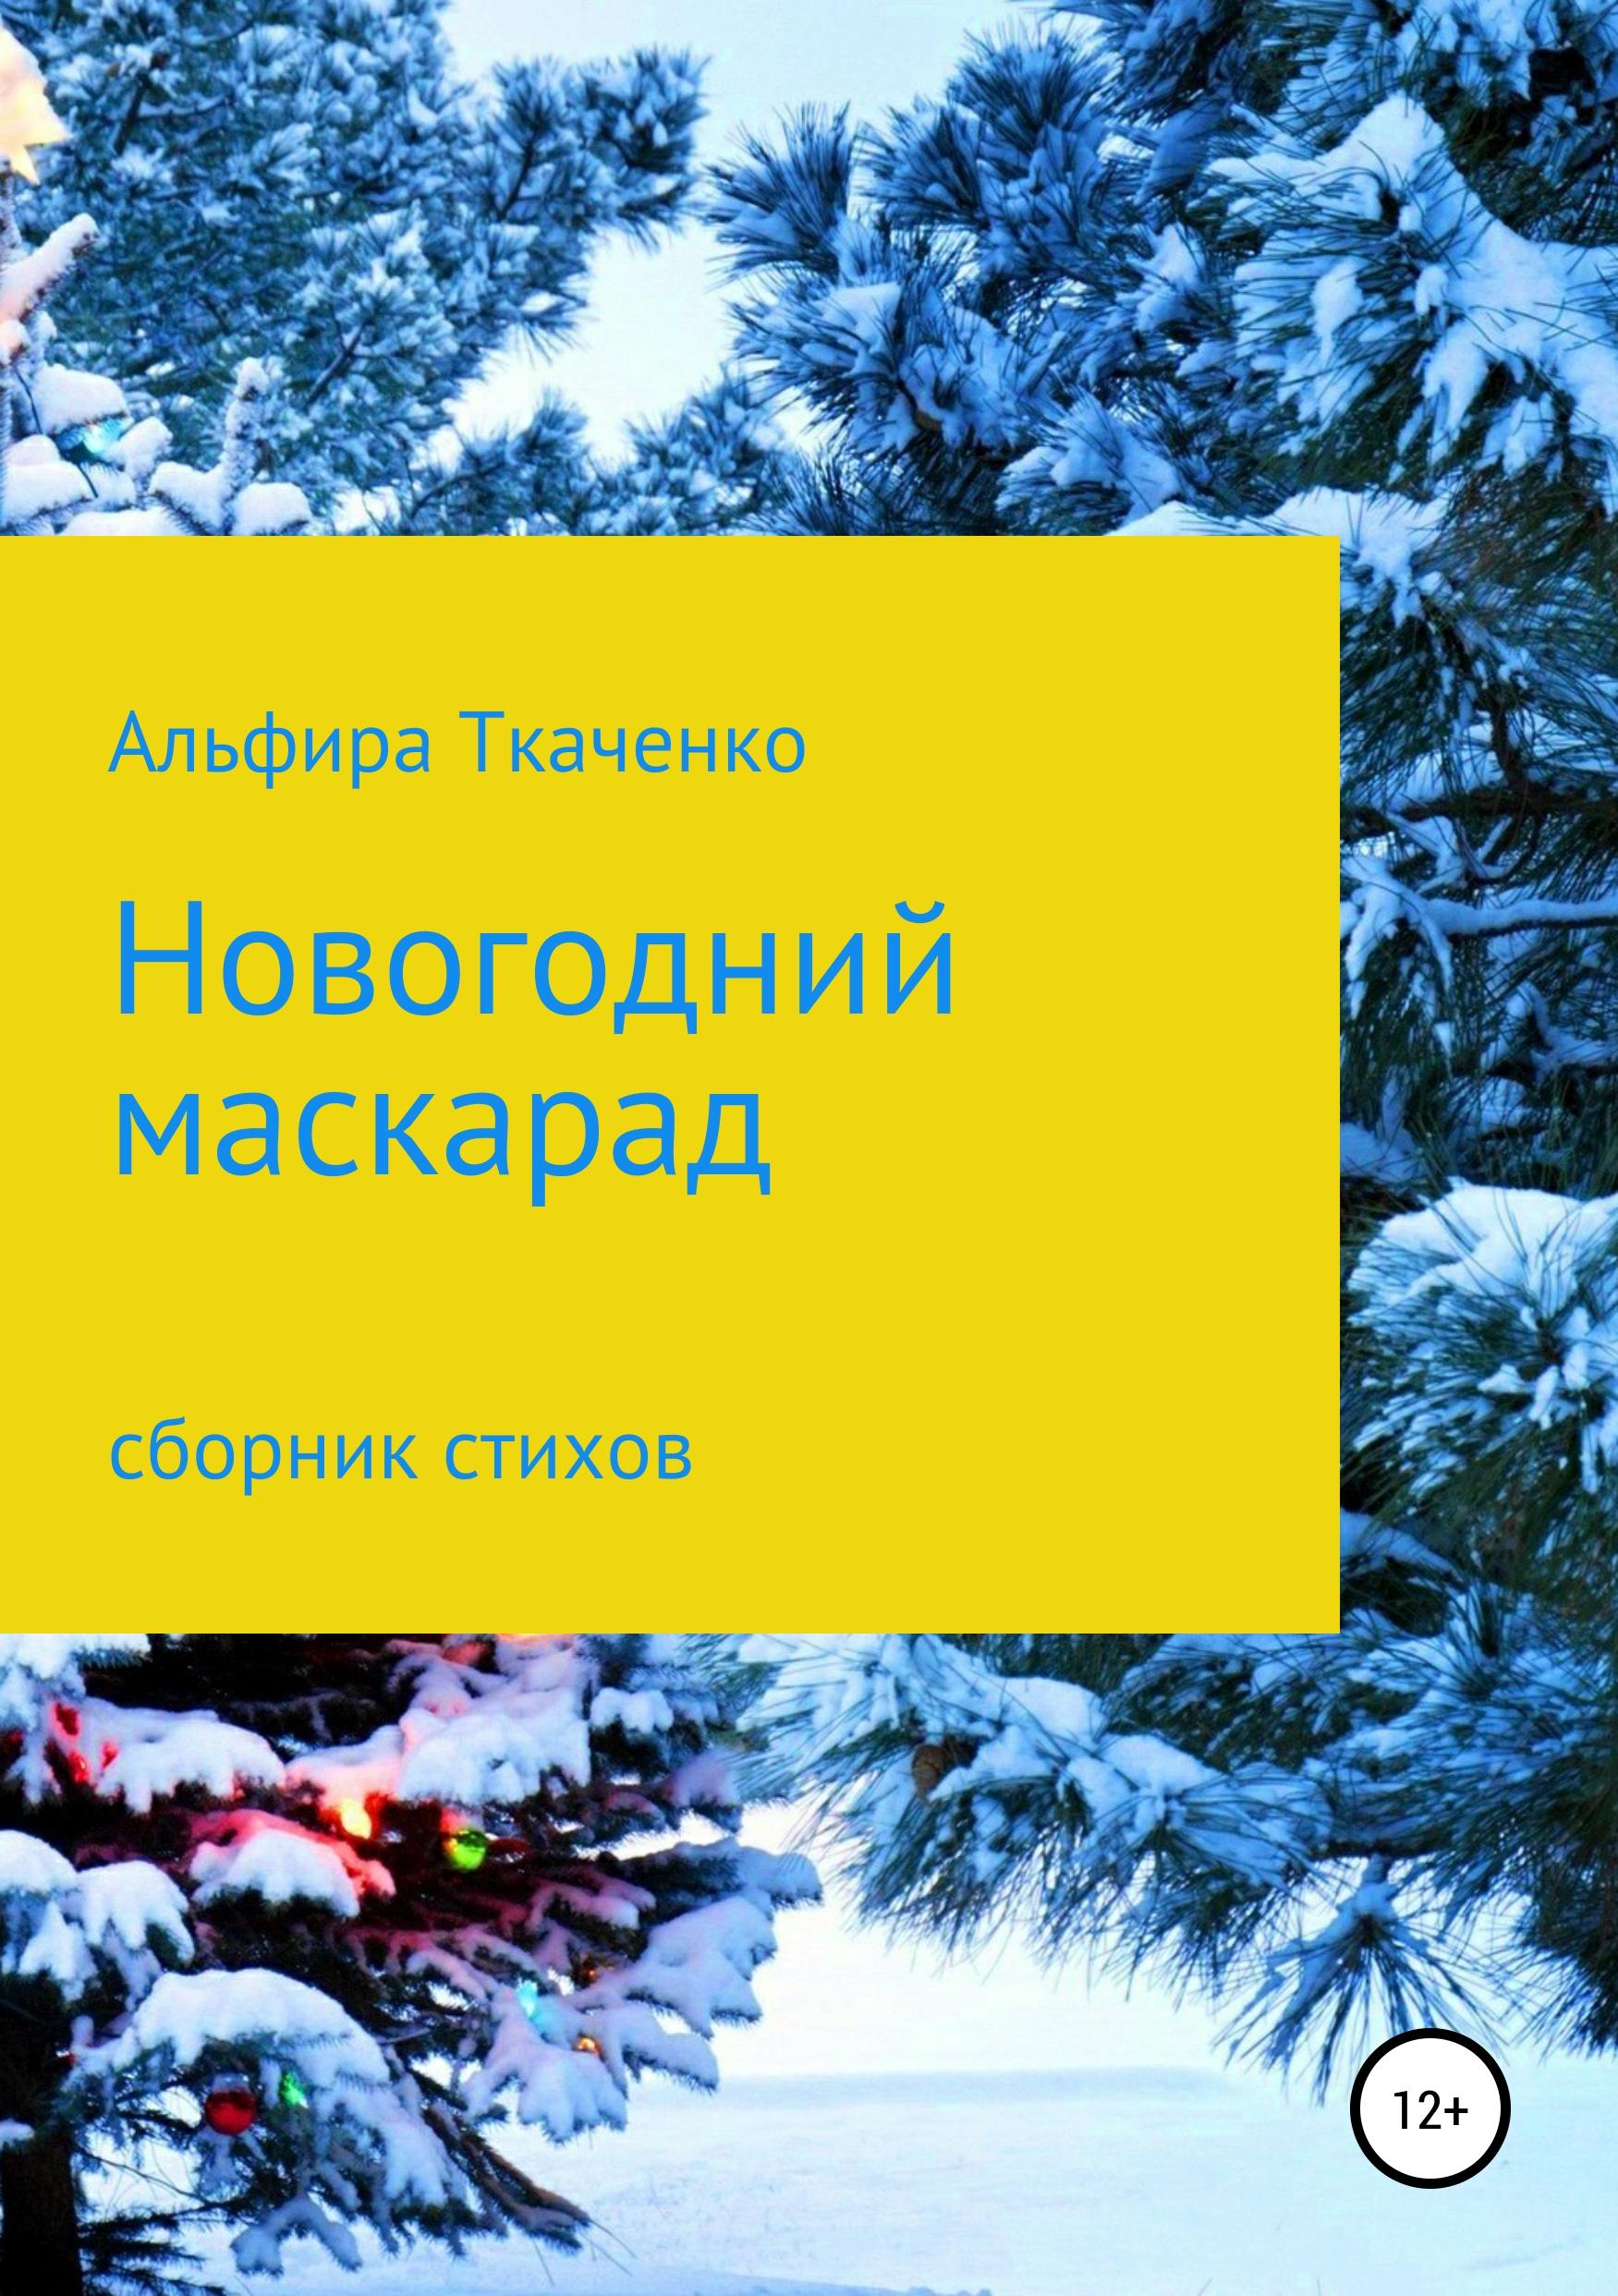 Альфира Федоровна Ткаченко Новогодний маскарад. Сборник стихотворений ник шпанов красный камень сборник